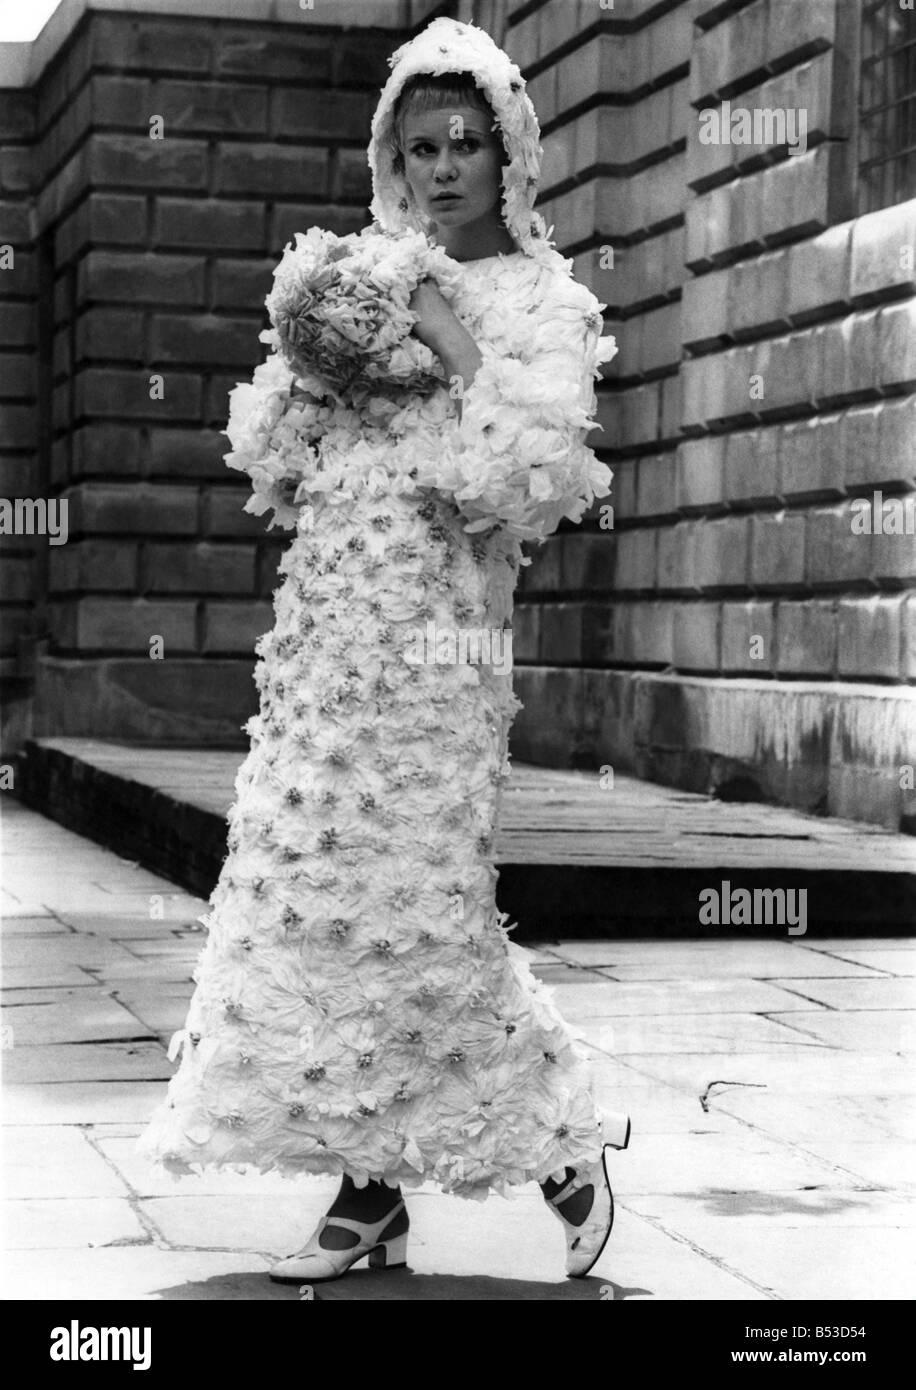 Secret Wedding Stockfotos & Secret Wedding Bilder - Alamy